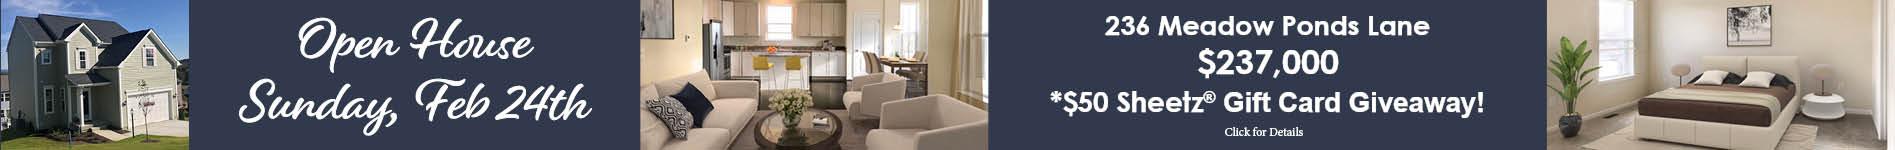 TheMeadows-OpenHouse-4col.jpg